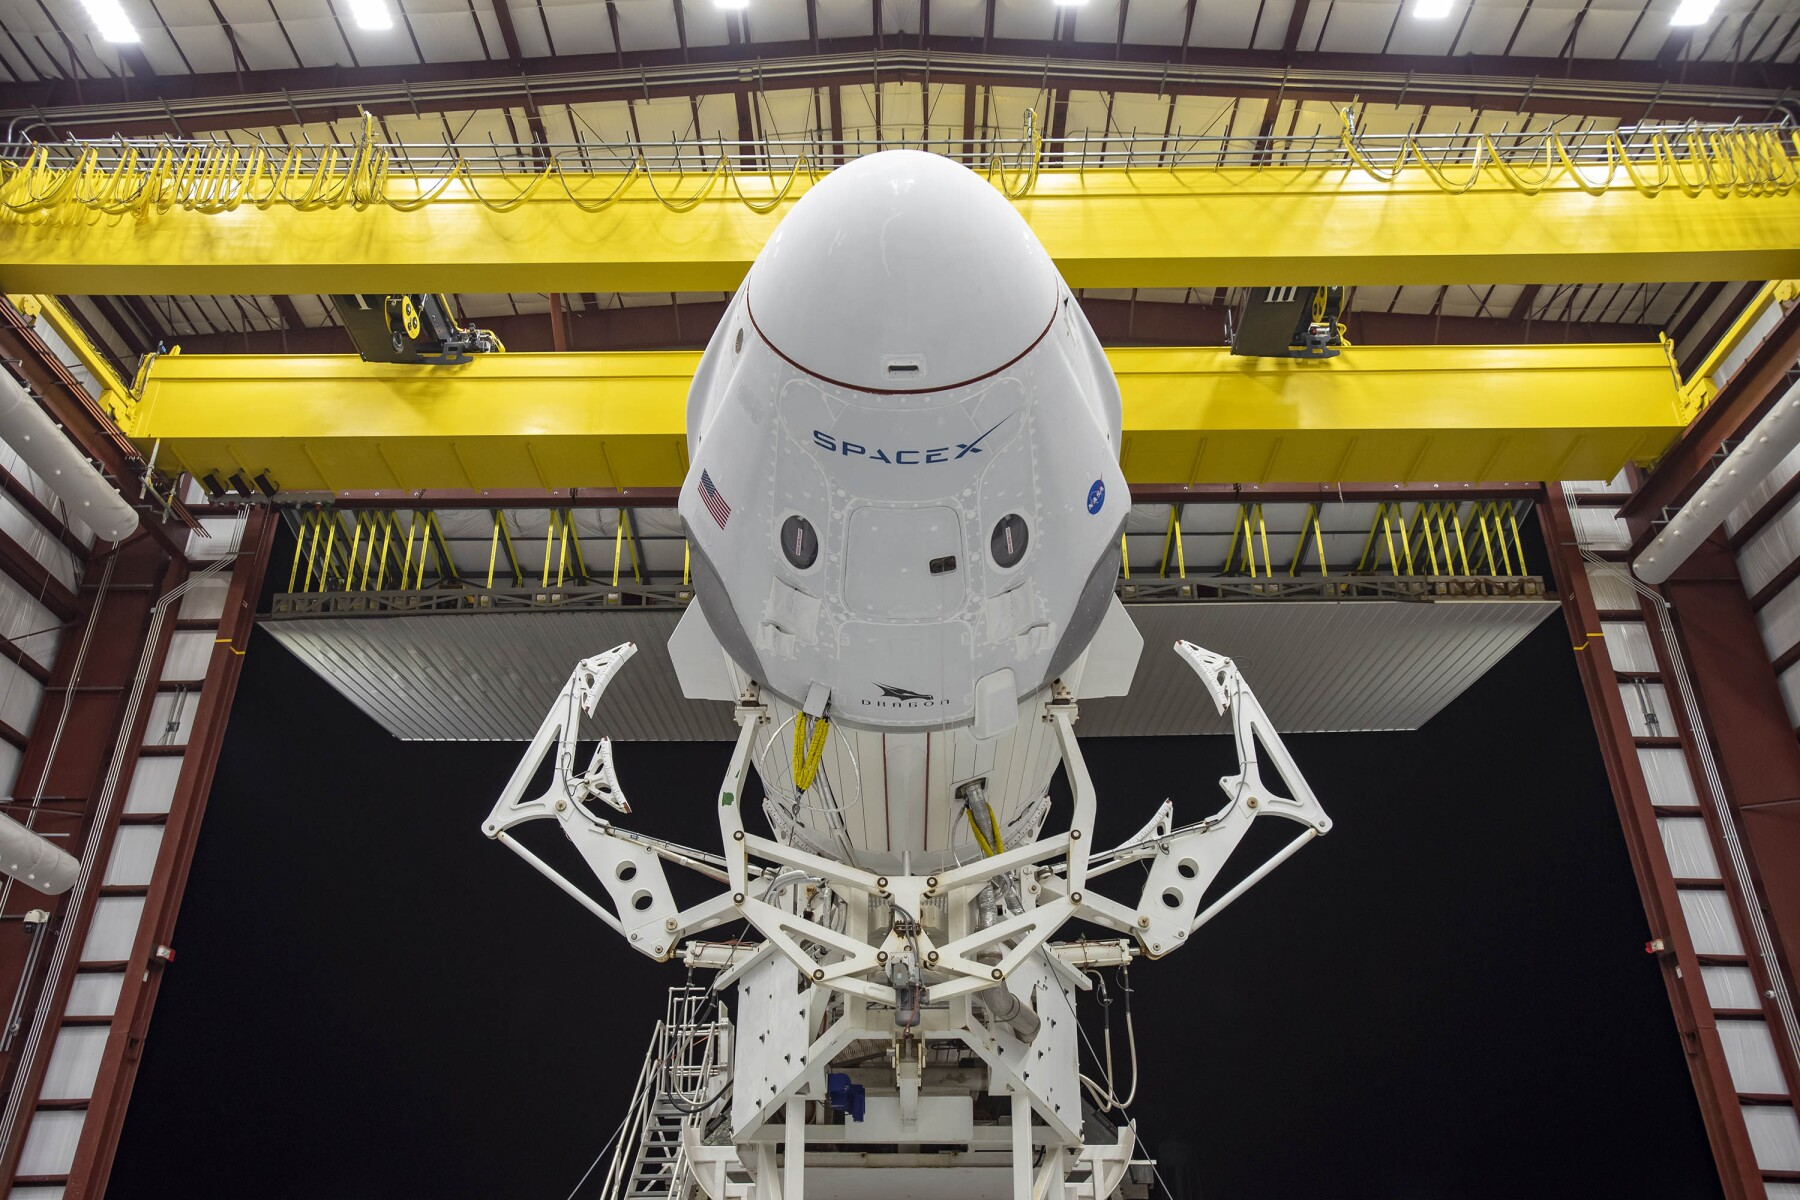 spacex nasa.jpg